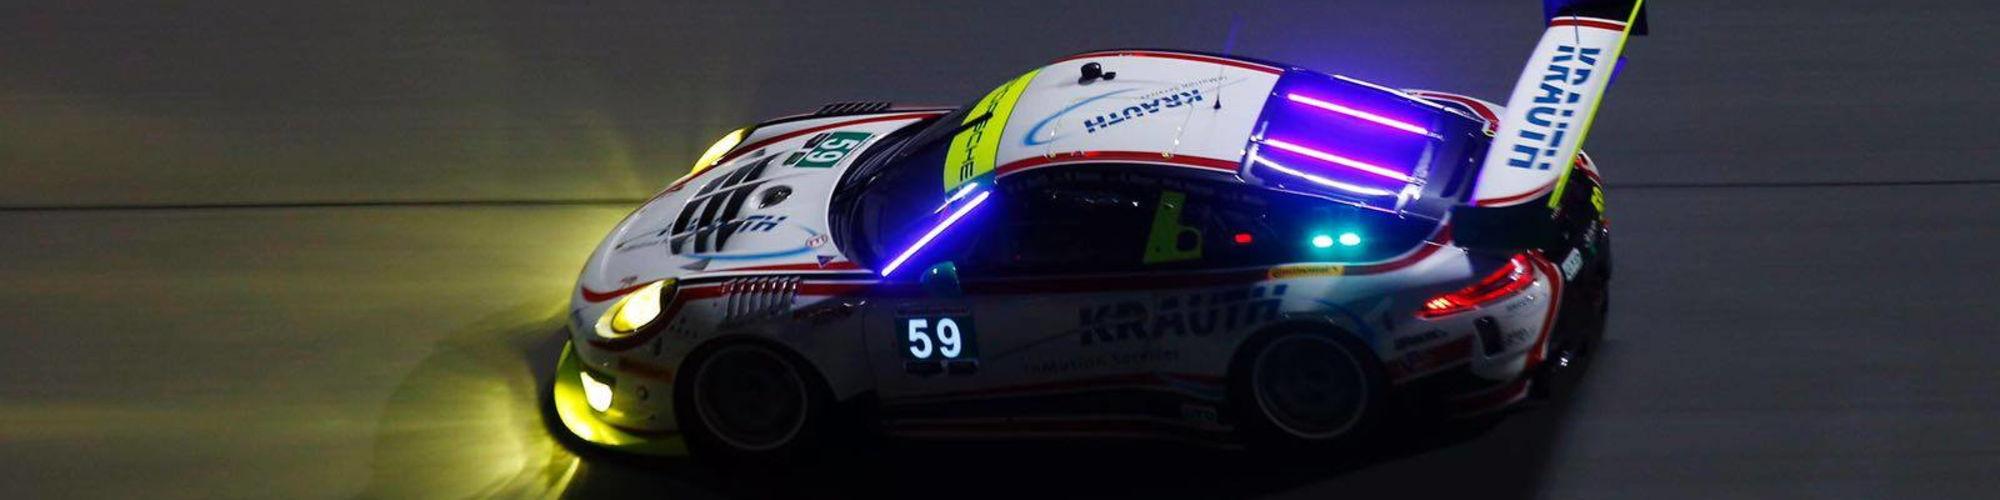 Renger Racing GmbH & Co. KG